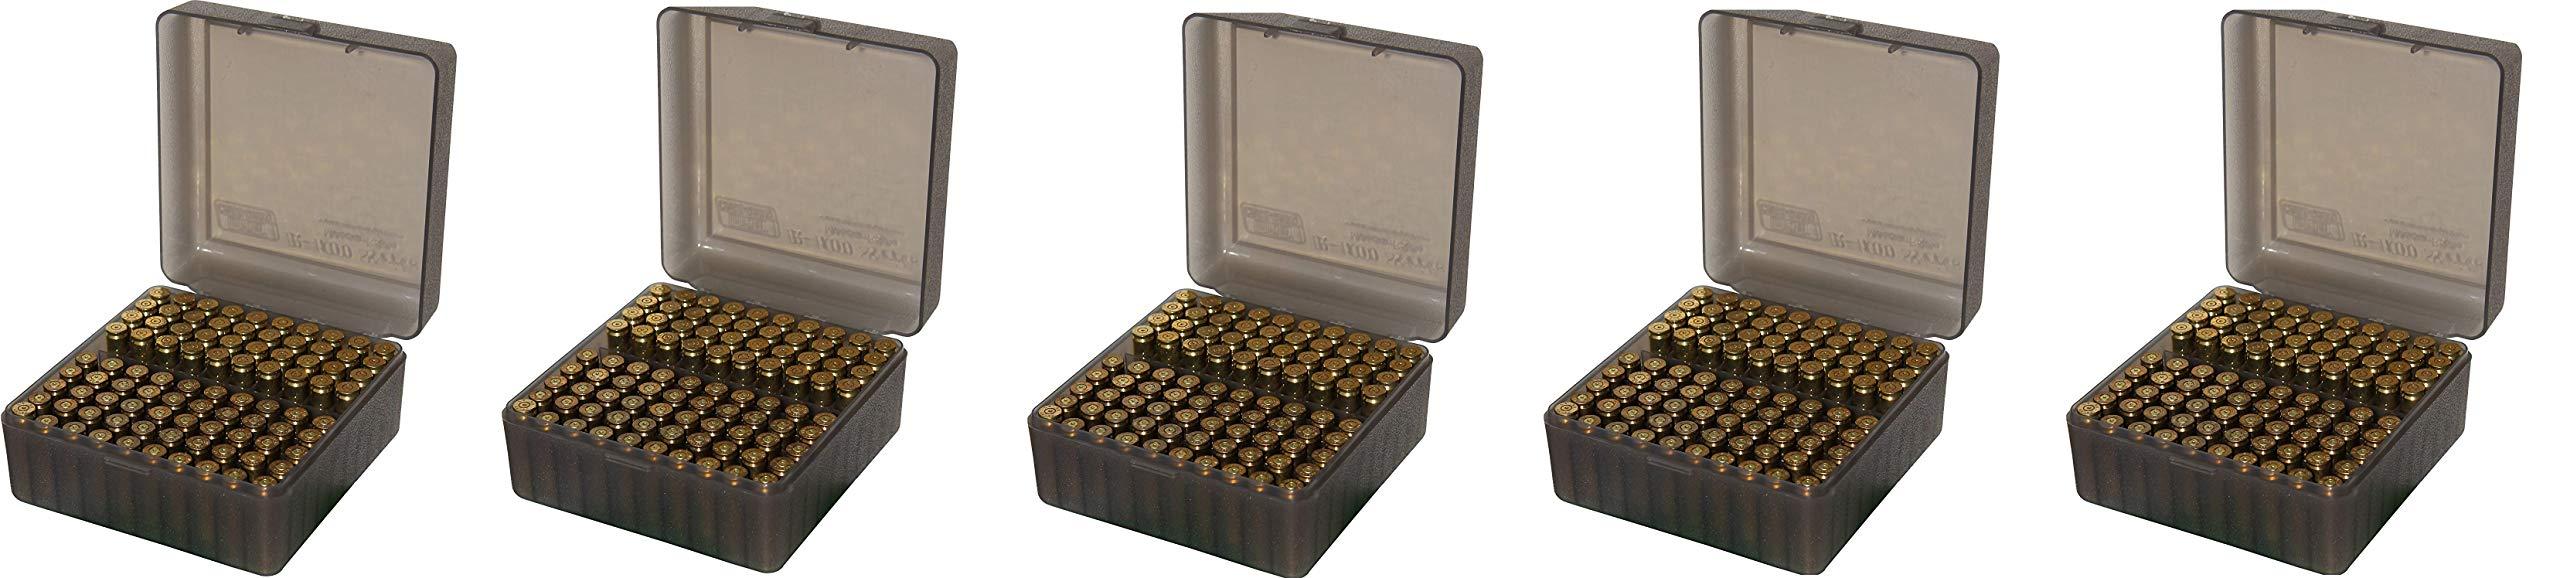 MTM 100 Round Flip-Top Rifle Ammo Box, Medium, Clear Smoke (Pack of 5)